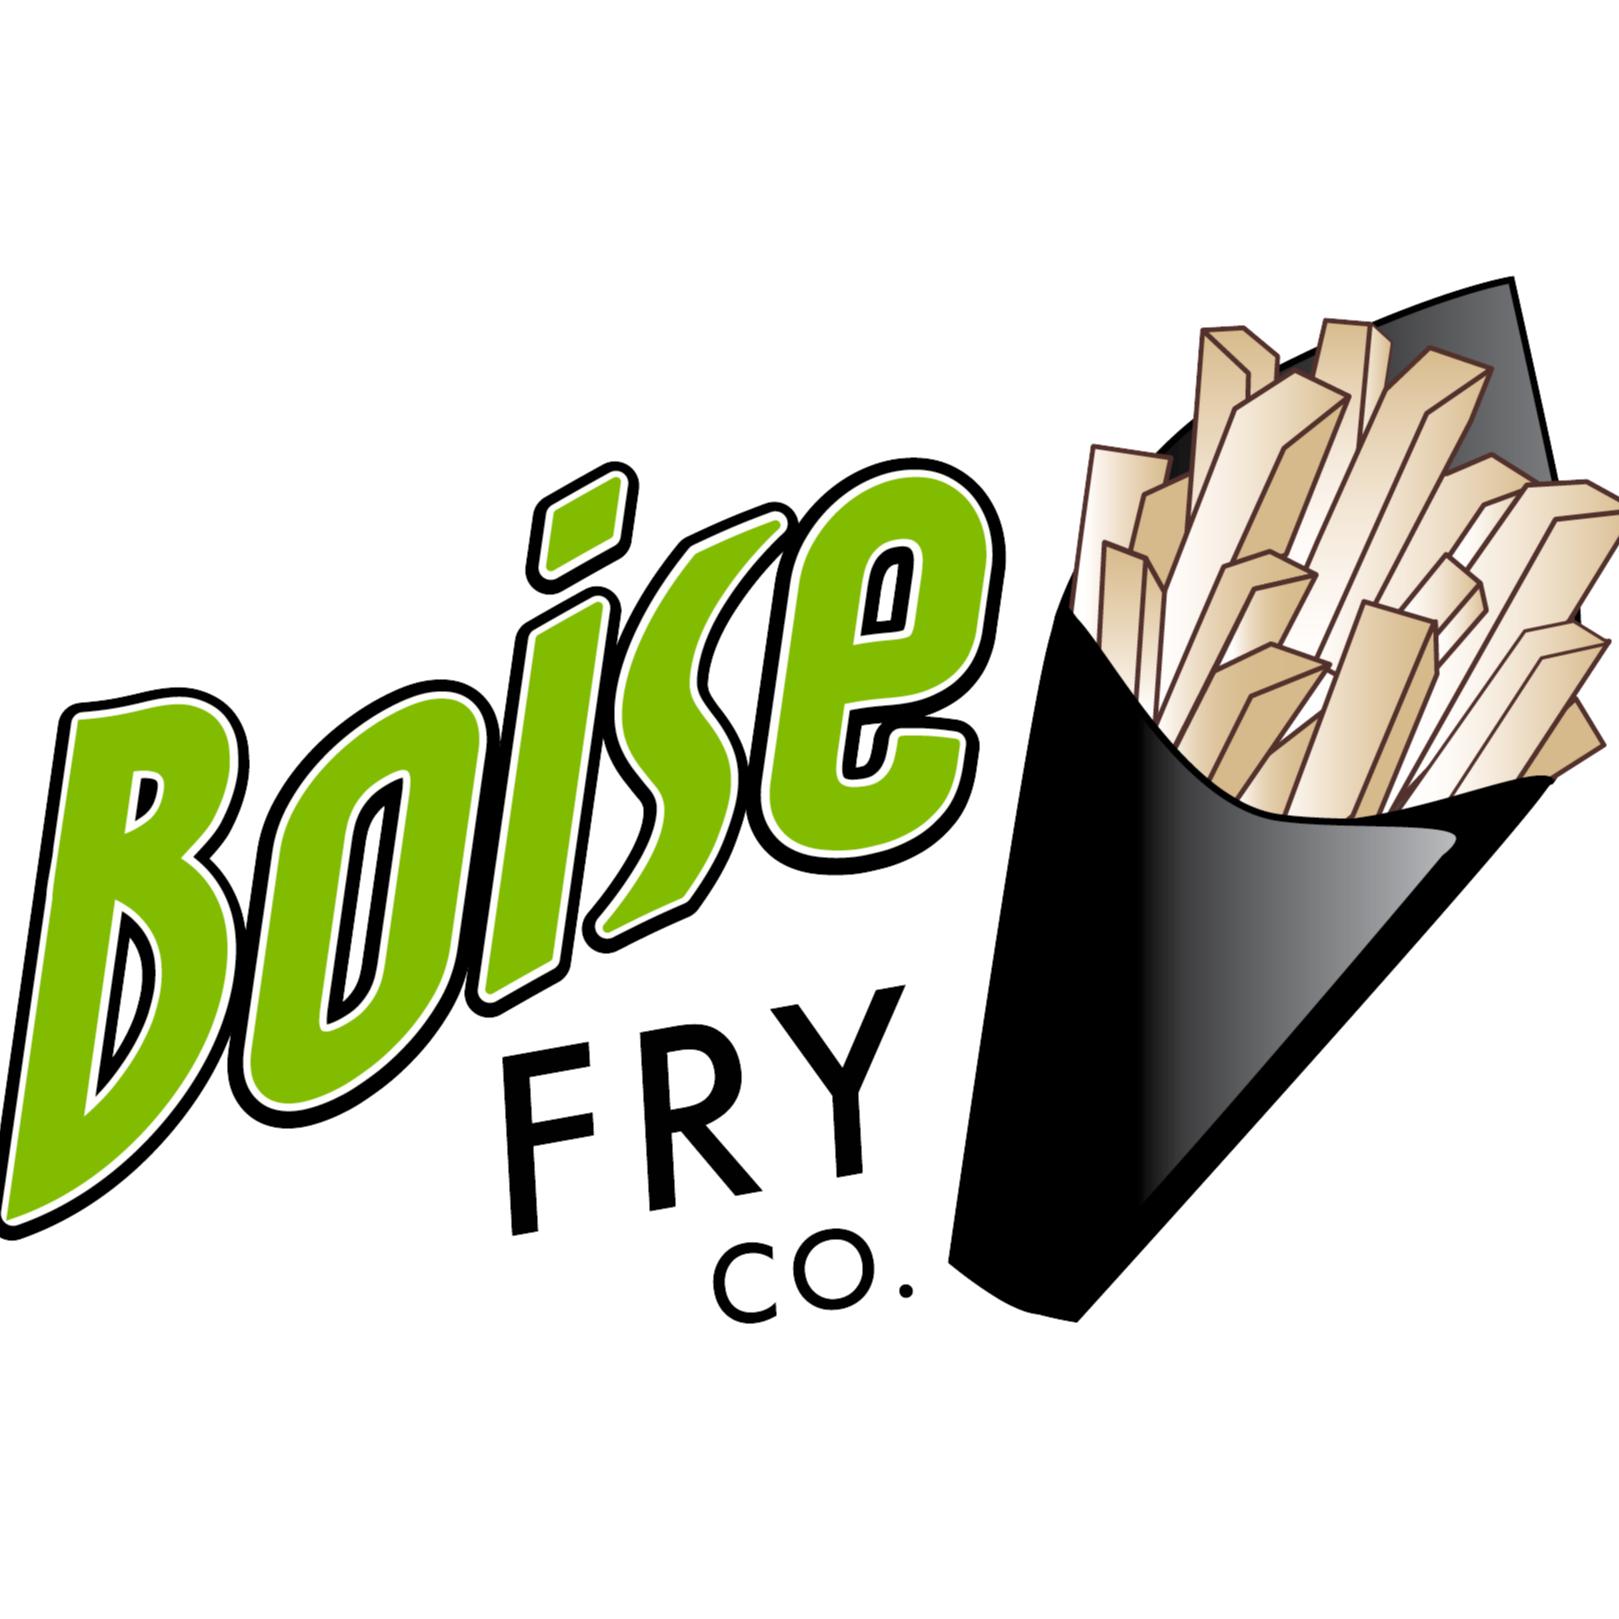 Boise Fry Company logo